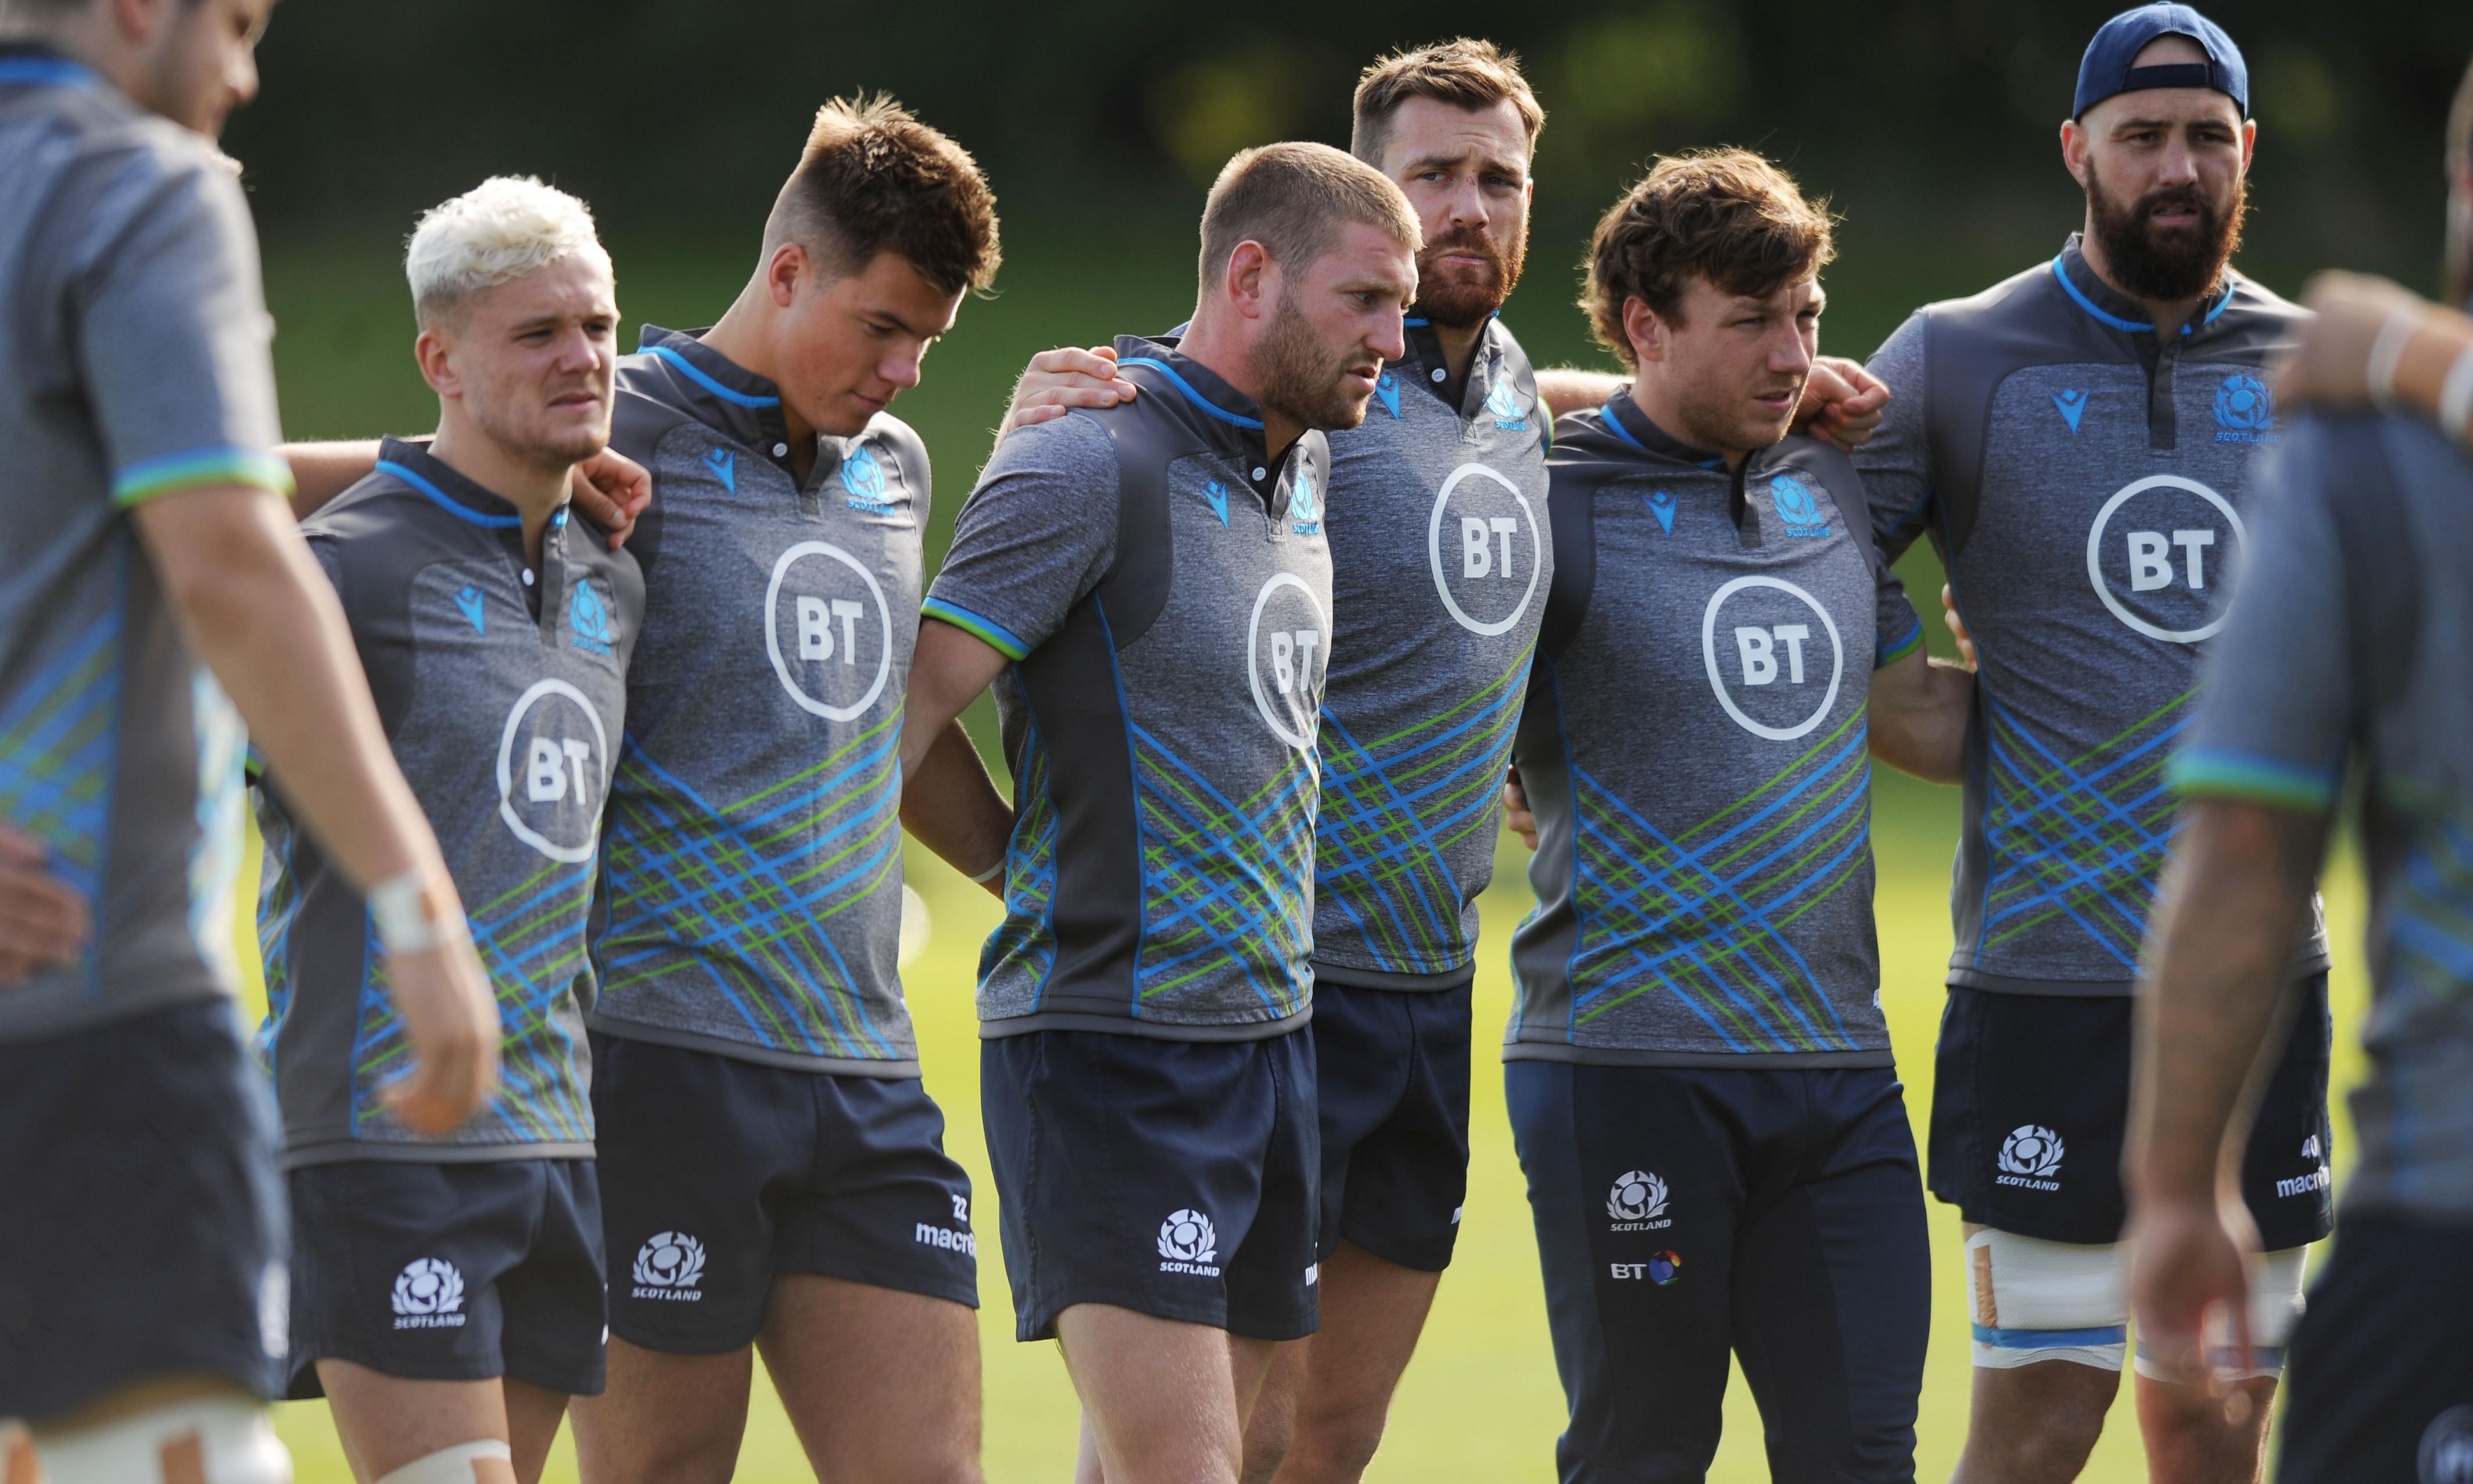 Scotland's Gregor Townsend faces selection headaches as France visit